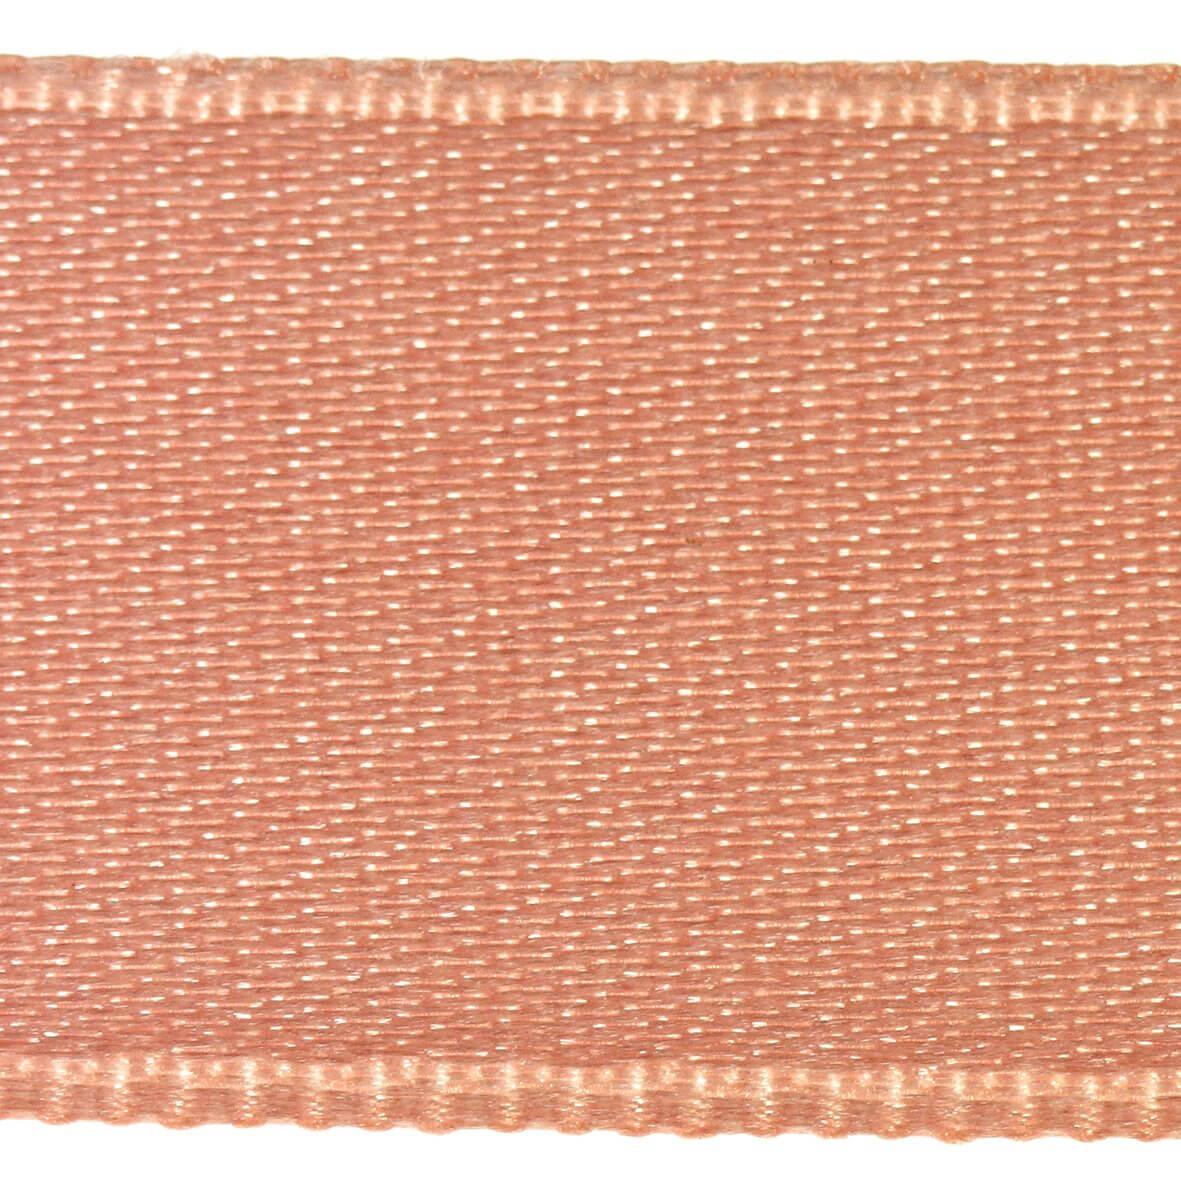 Peach Melba Col. 538 - 3mm Satab Satin Ribbon